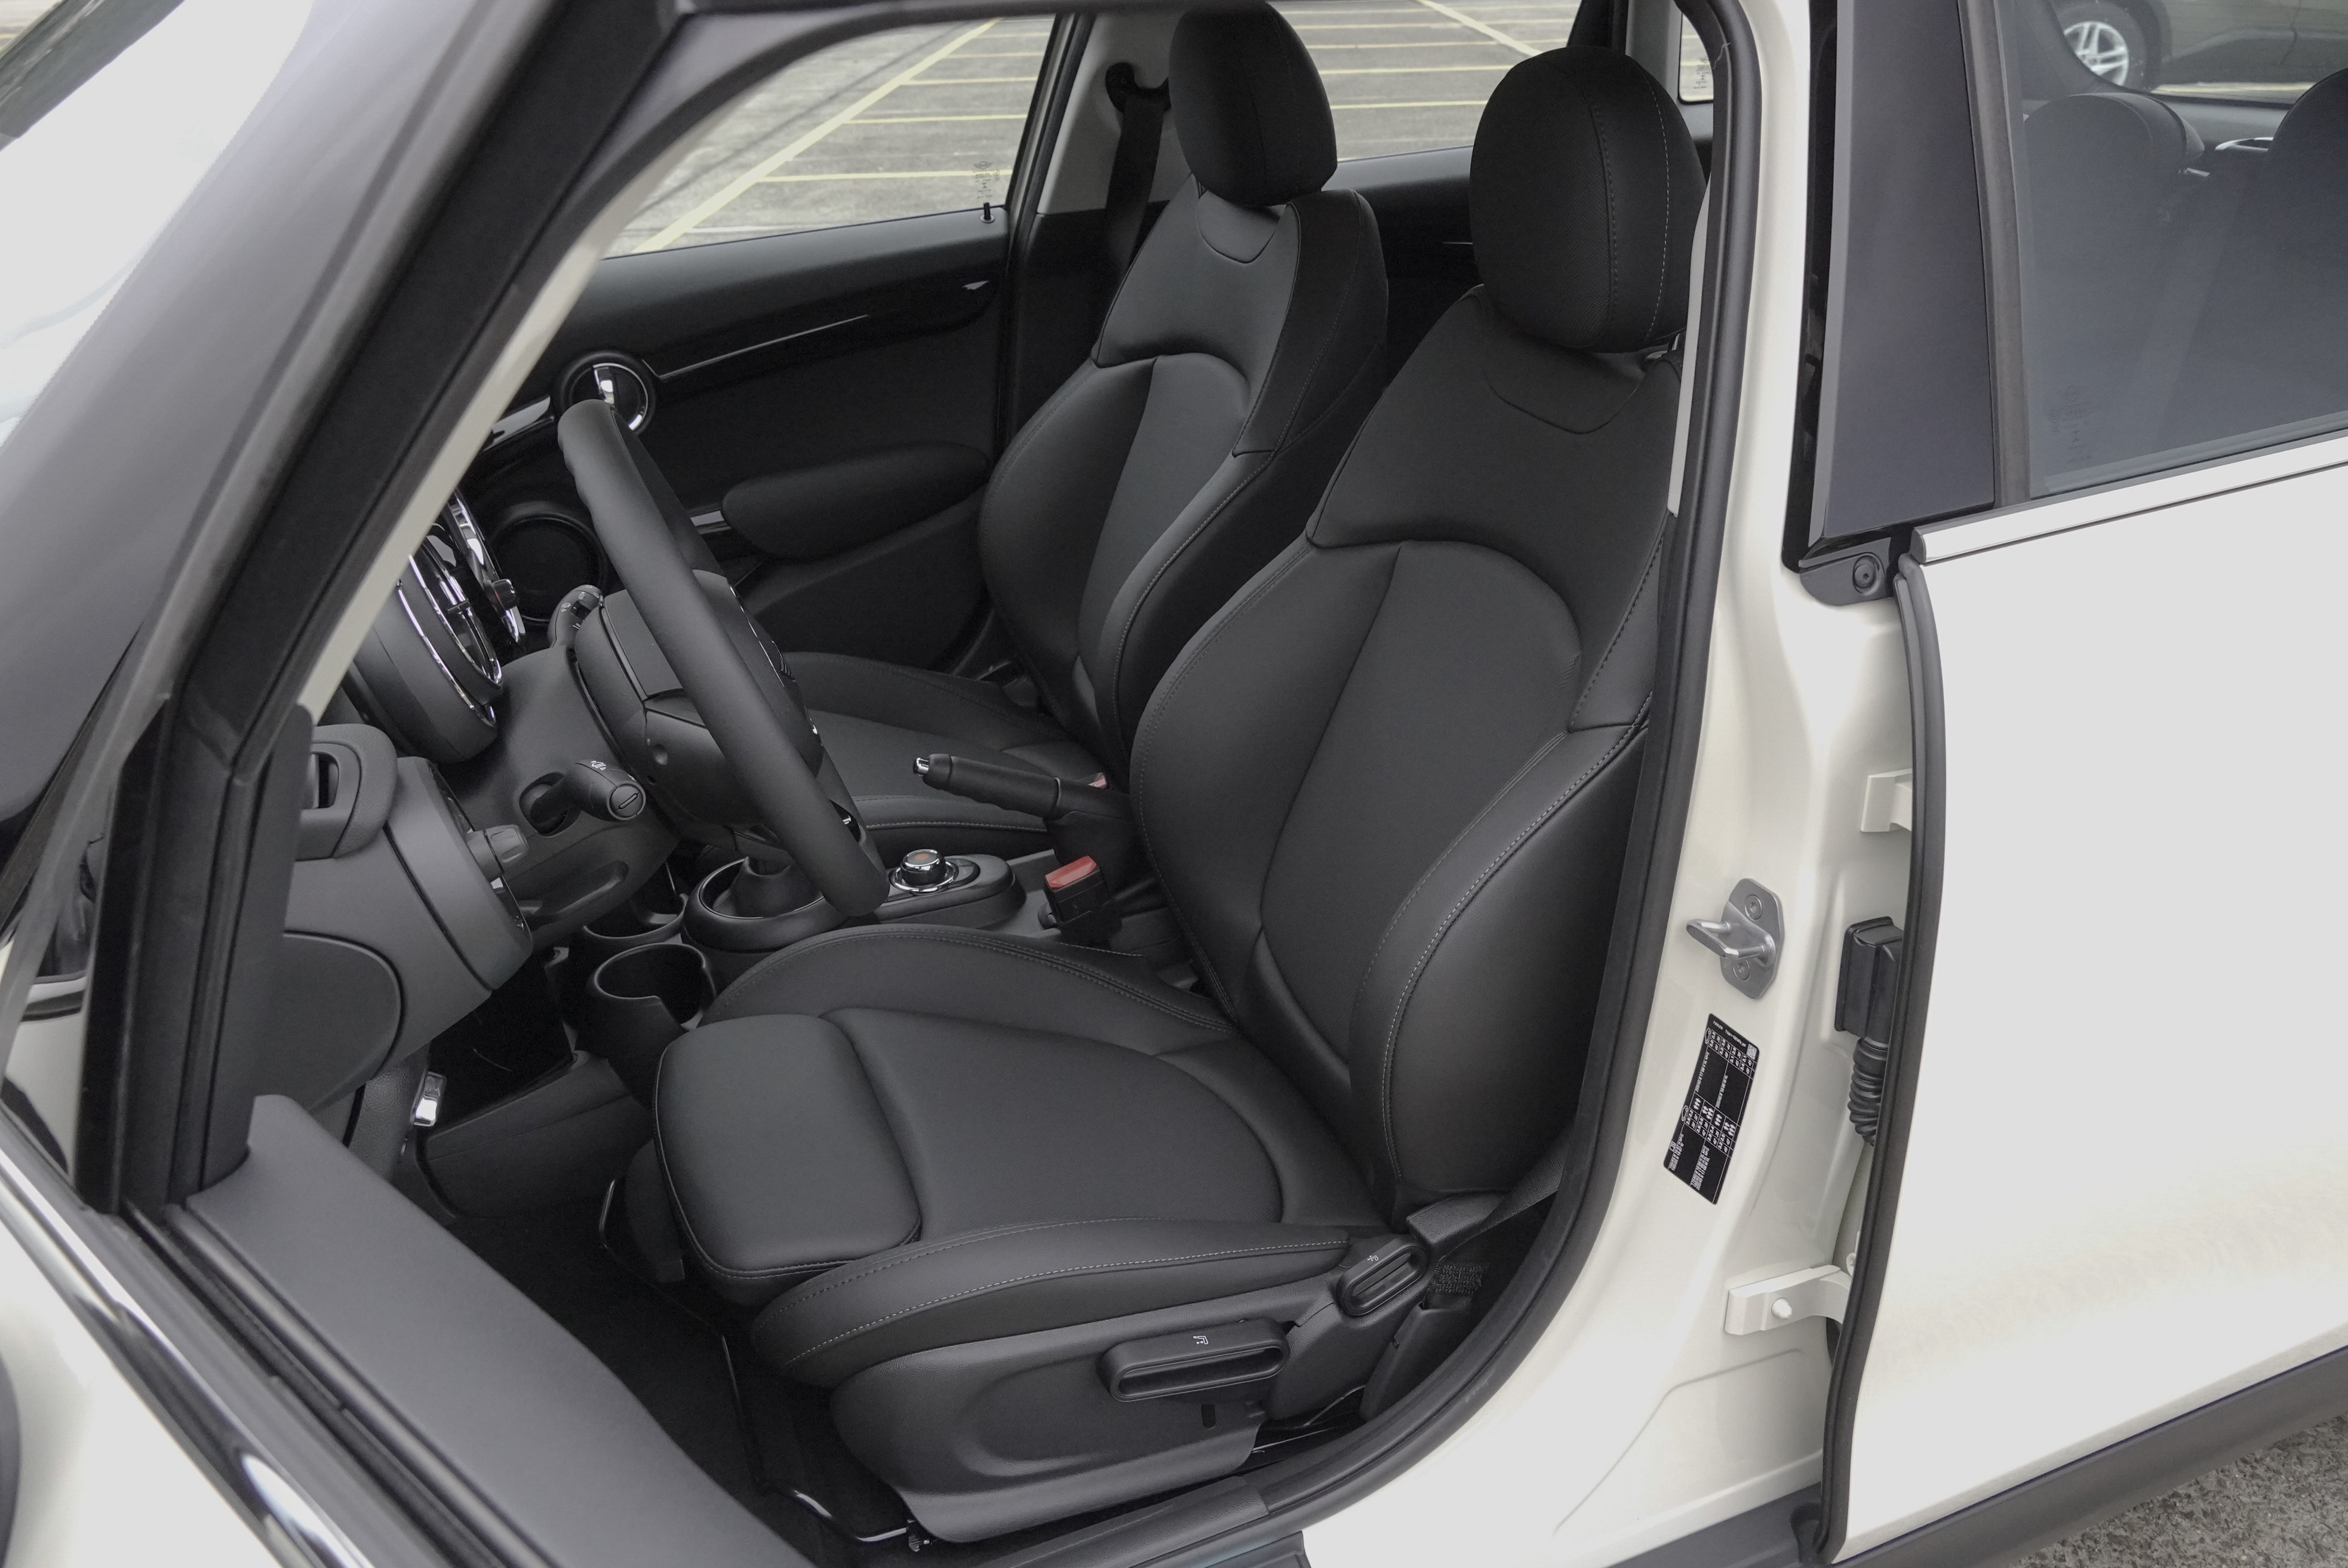 Cooper S 標配 Leatherette 舒適皮質跑車座椅。